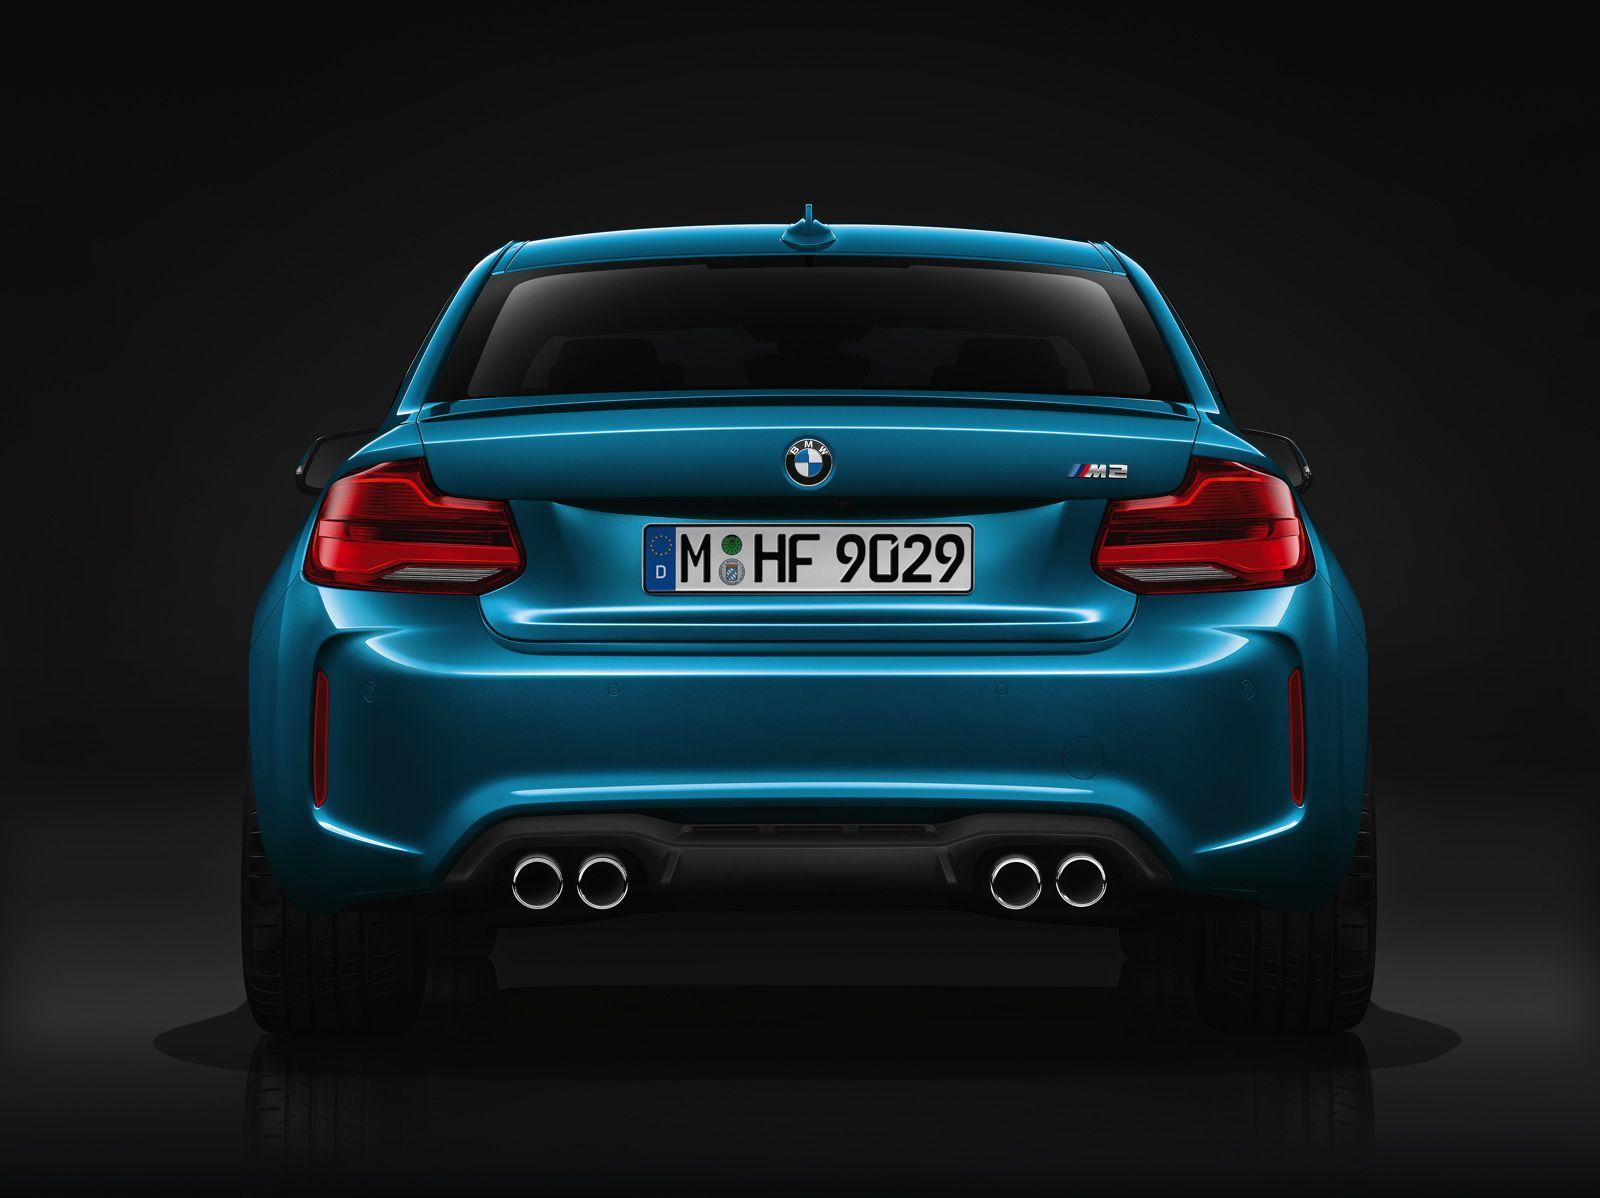 BMW M2 Рестайлинг, фото, задние LED фонари диодные LCI